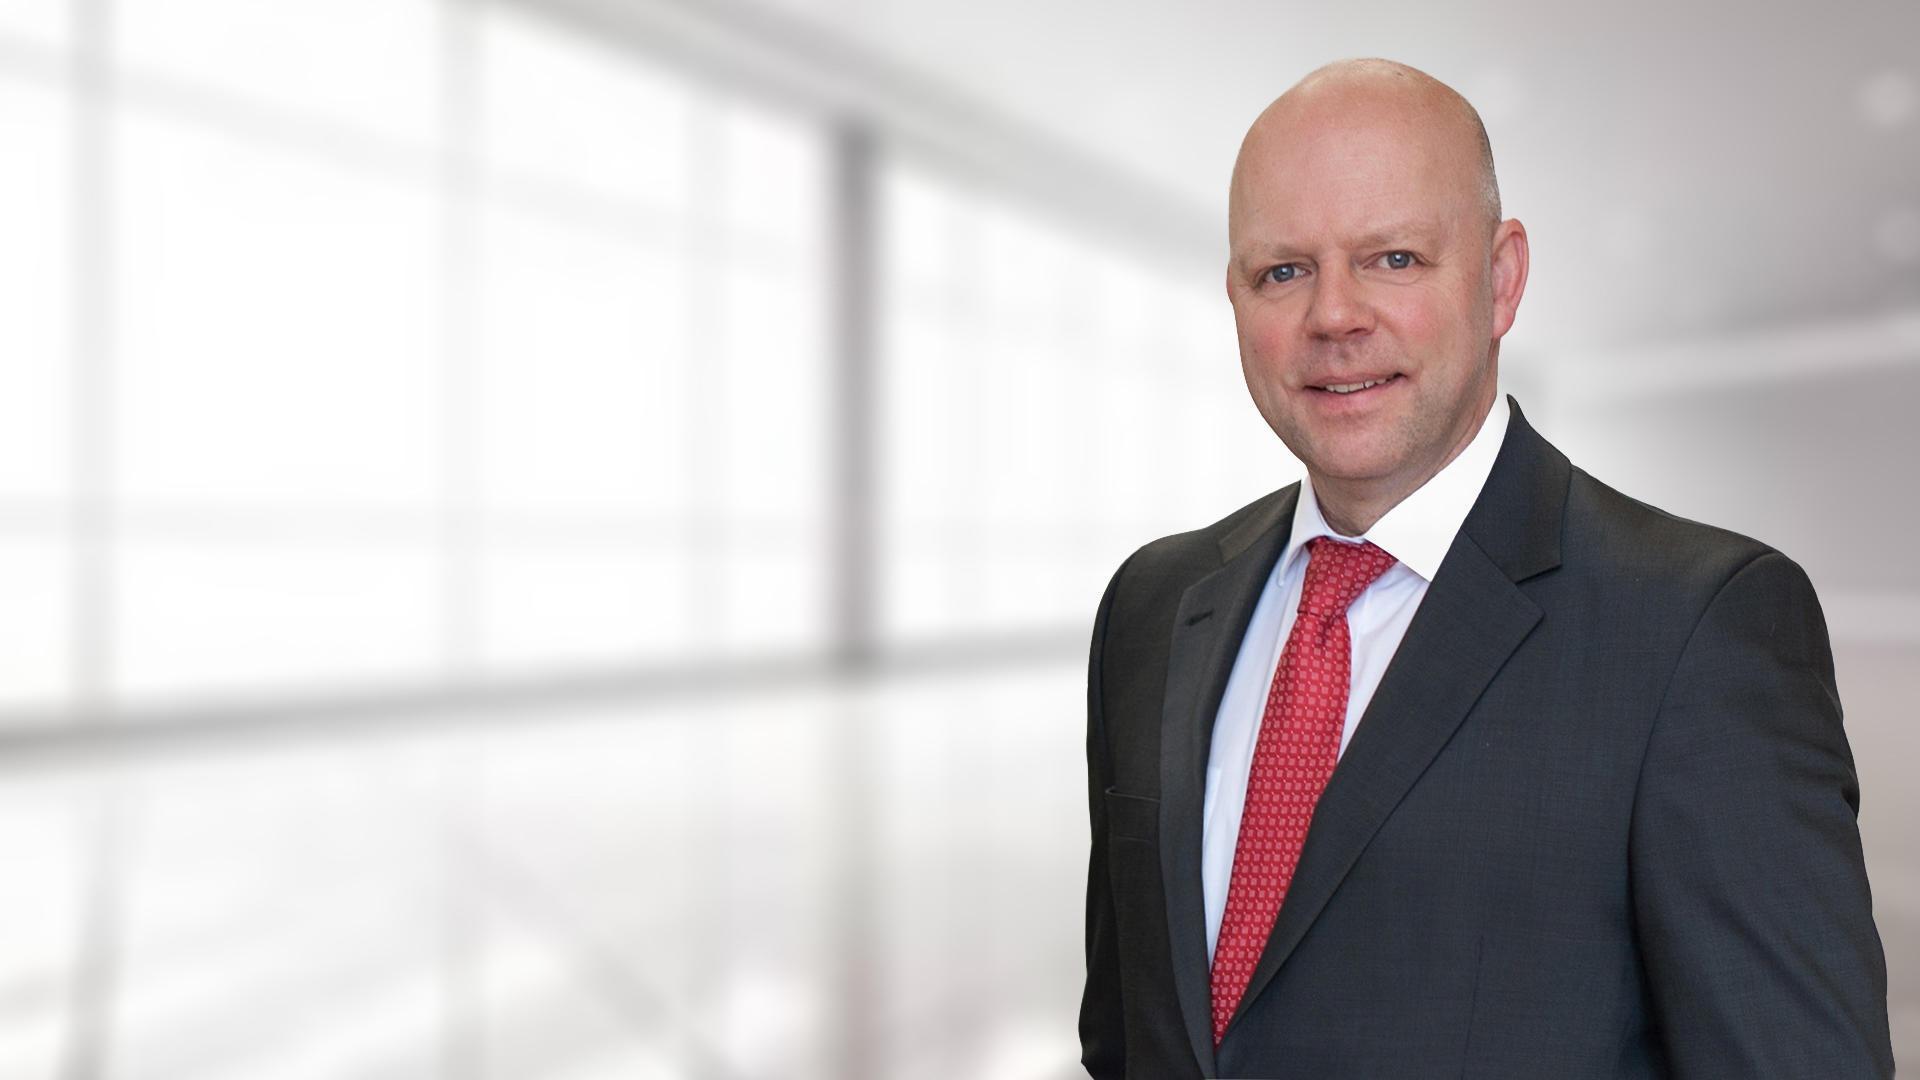 Rechtsanwalt Dirk Osthoff